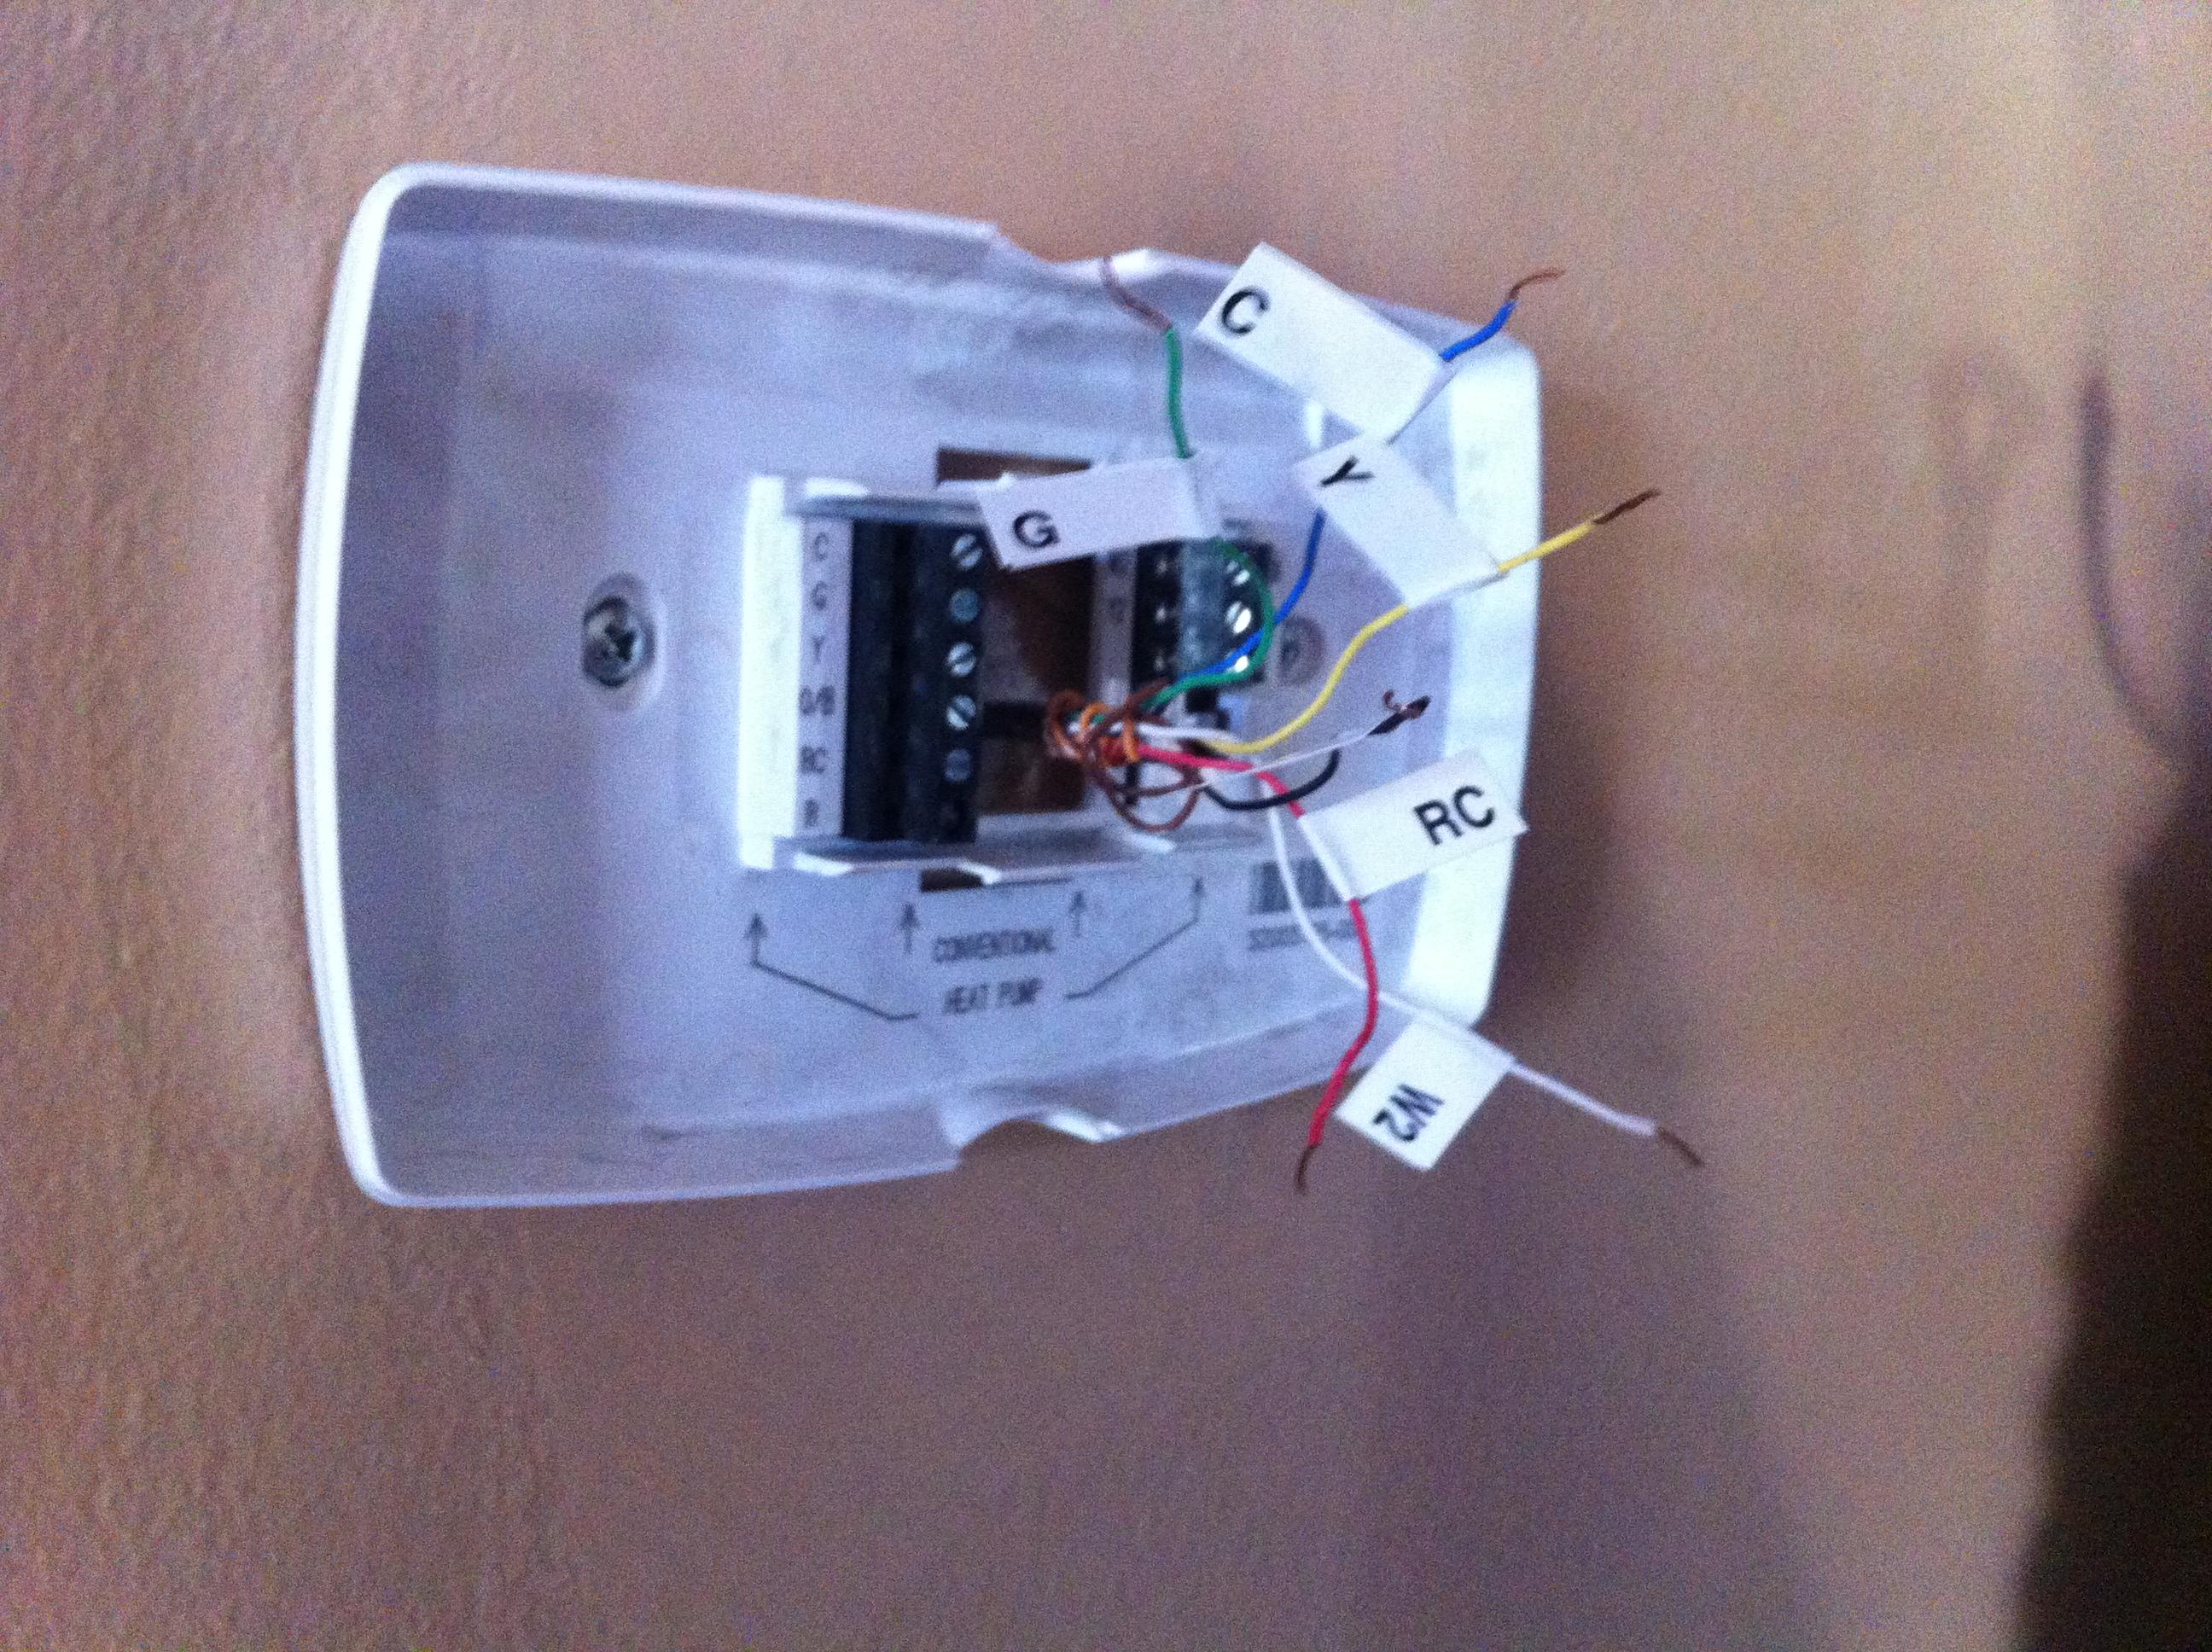 Filtrete Wi Fi Touch Screen Programmable Thermostatjpgv